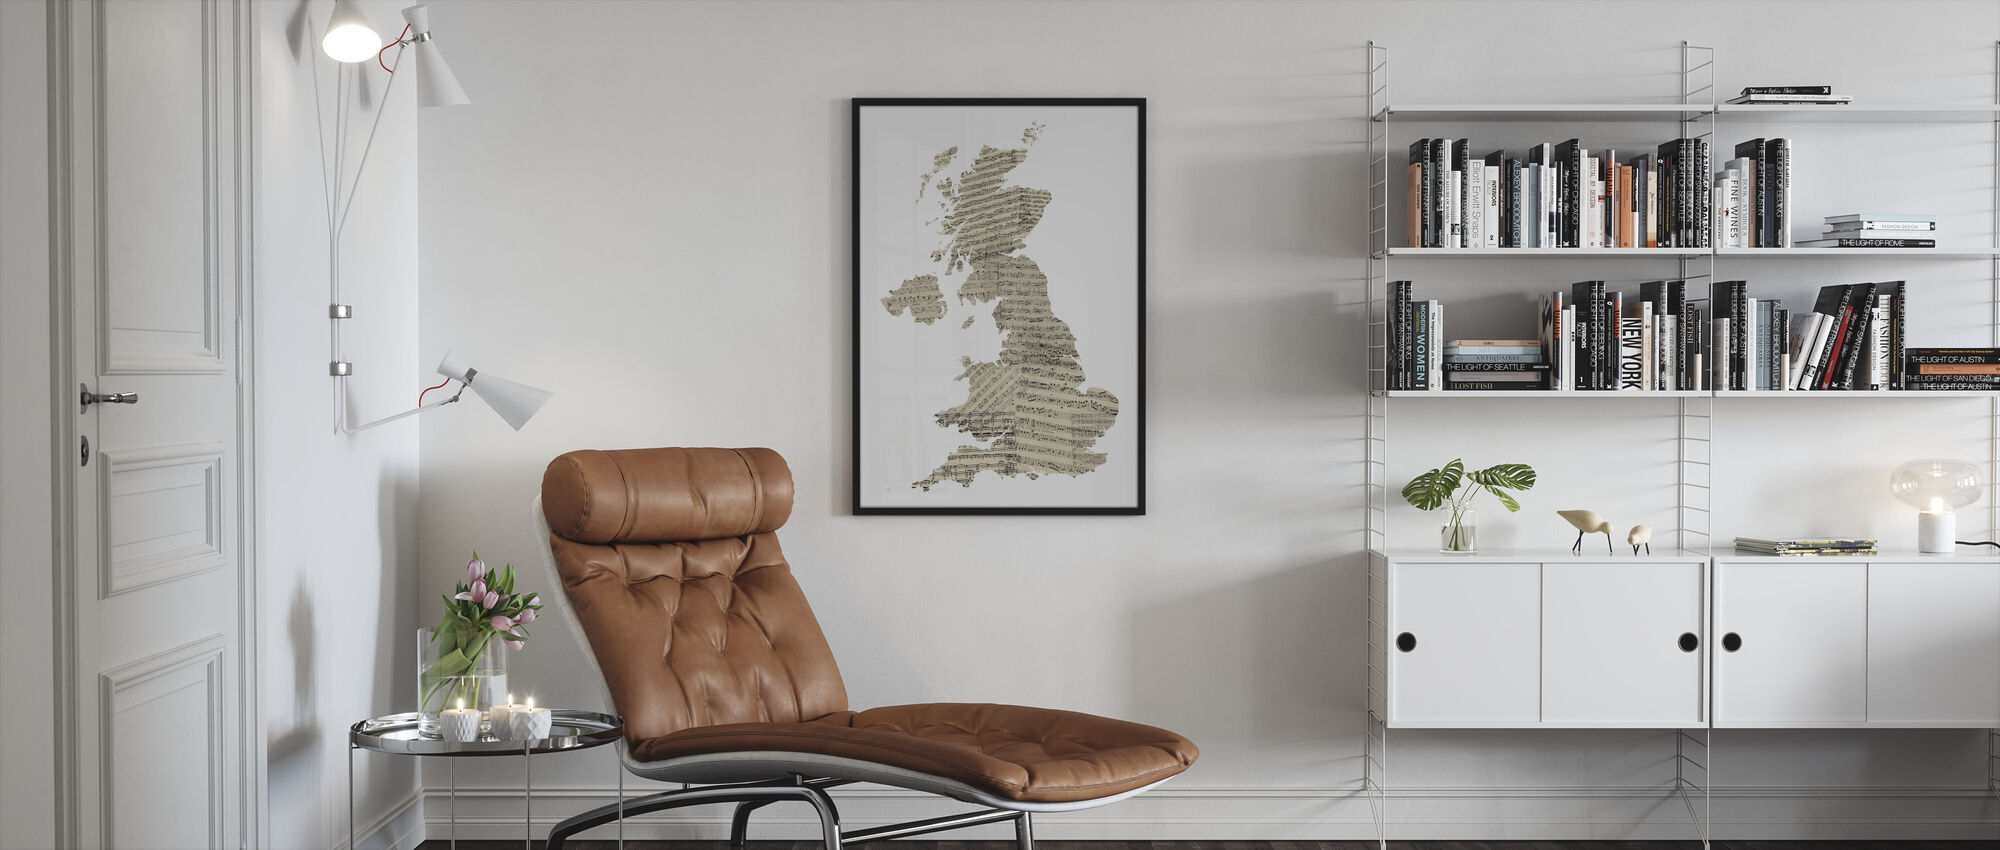 Iso-Britannia Vanha Music Net Kartta - Kehystetty kuva - Olohuone